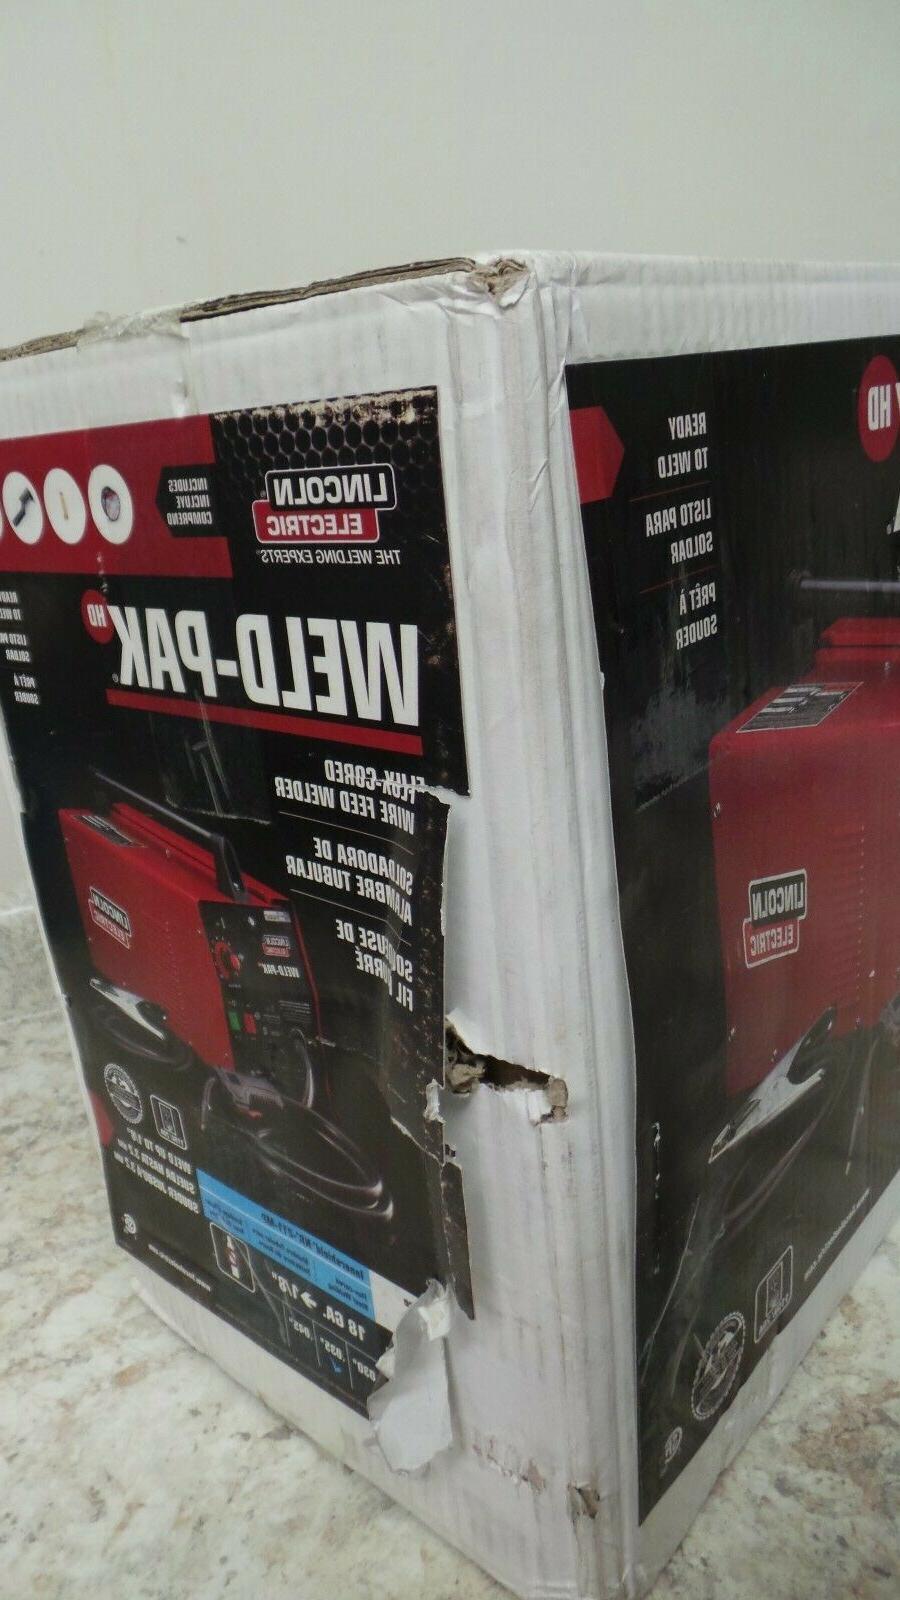 New Lincoln Weld-Pak K2188-1 Flux-Cored Feed Welder 60209-1